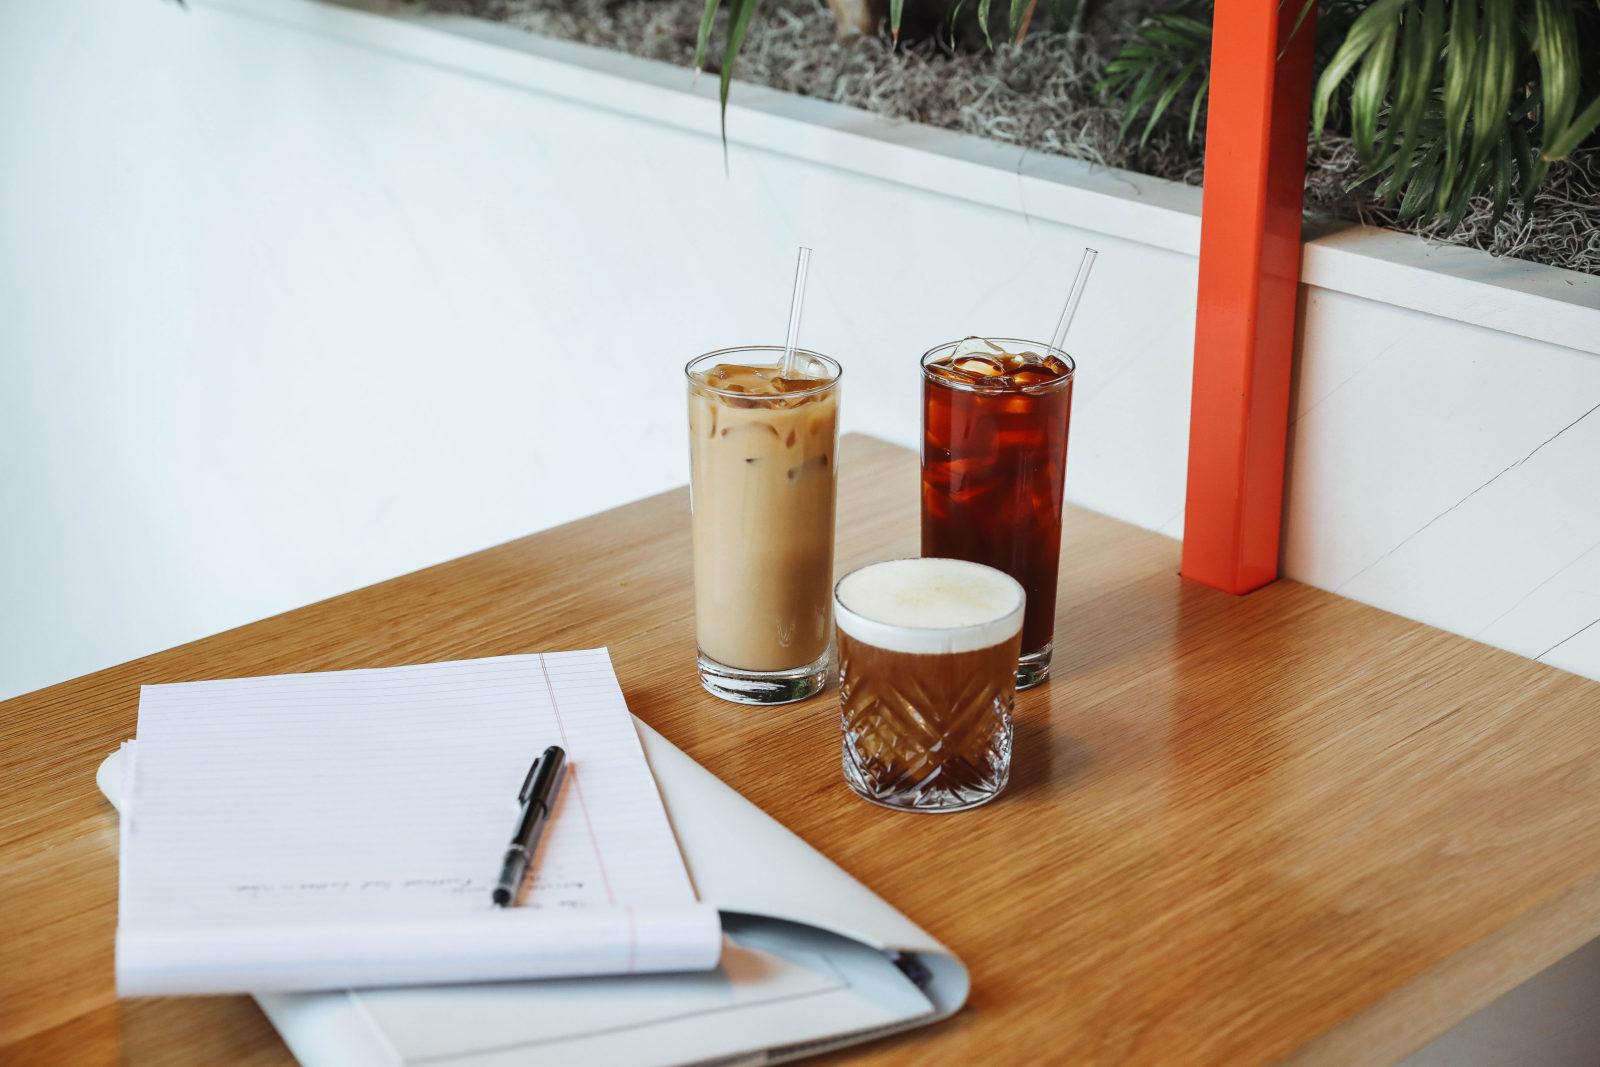 Stay Golden - coffee in nashville